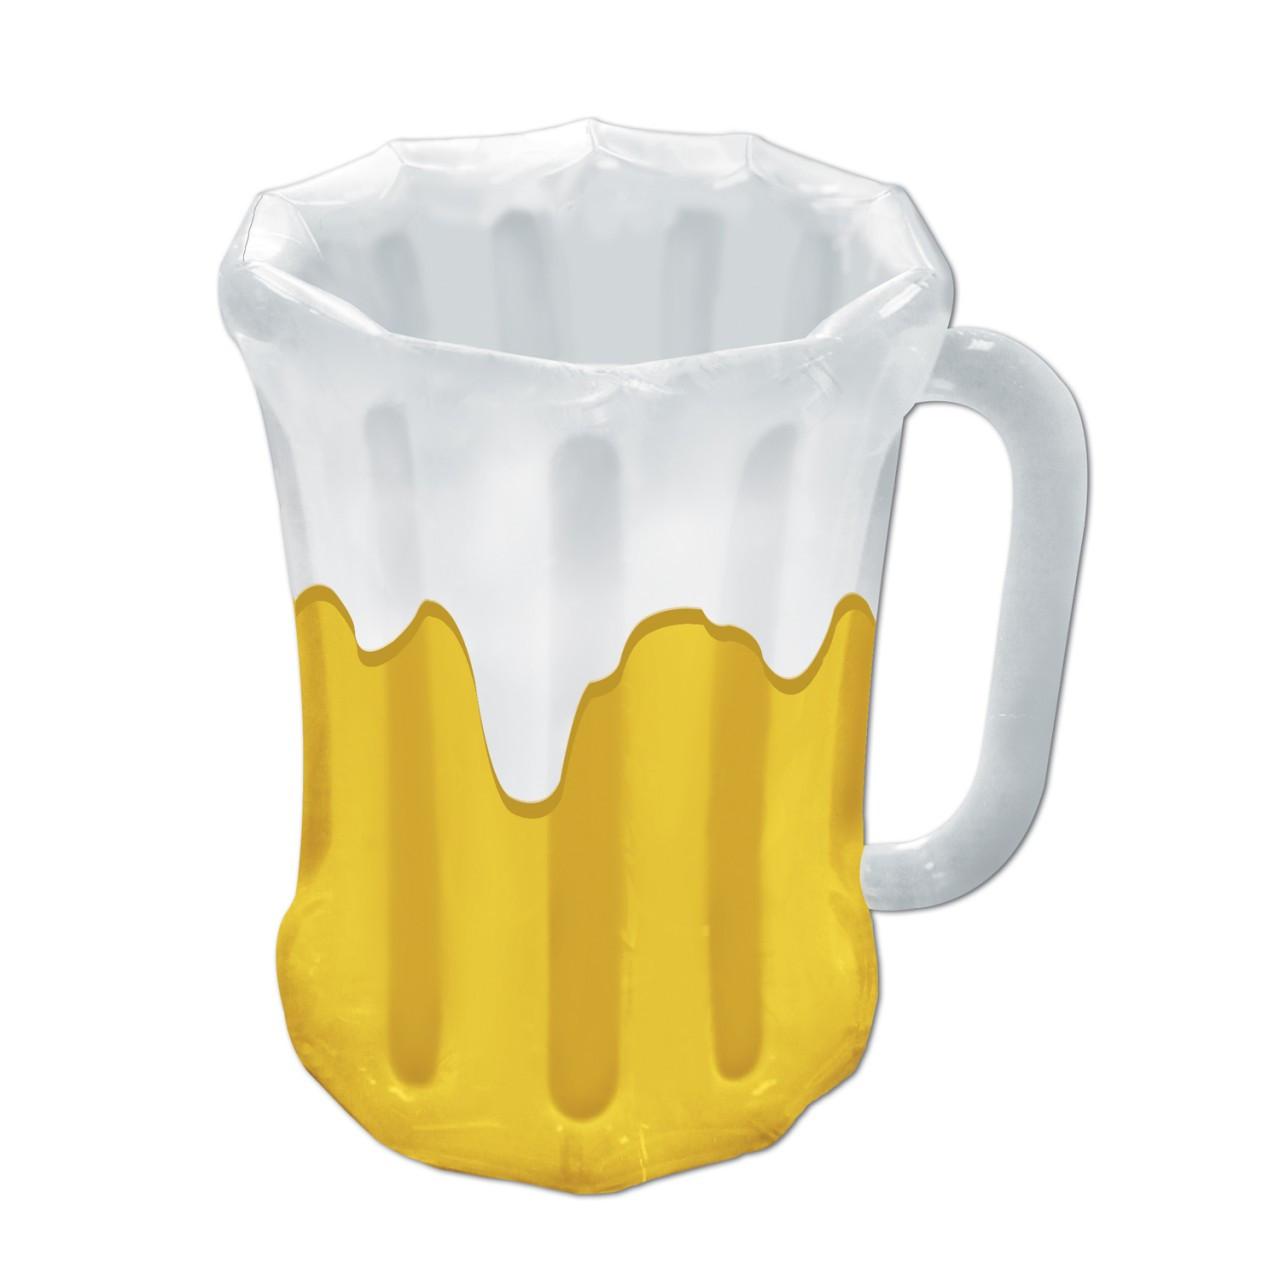 Beer Mug Inflatable Cooler Germansteins Com